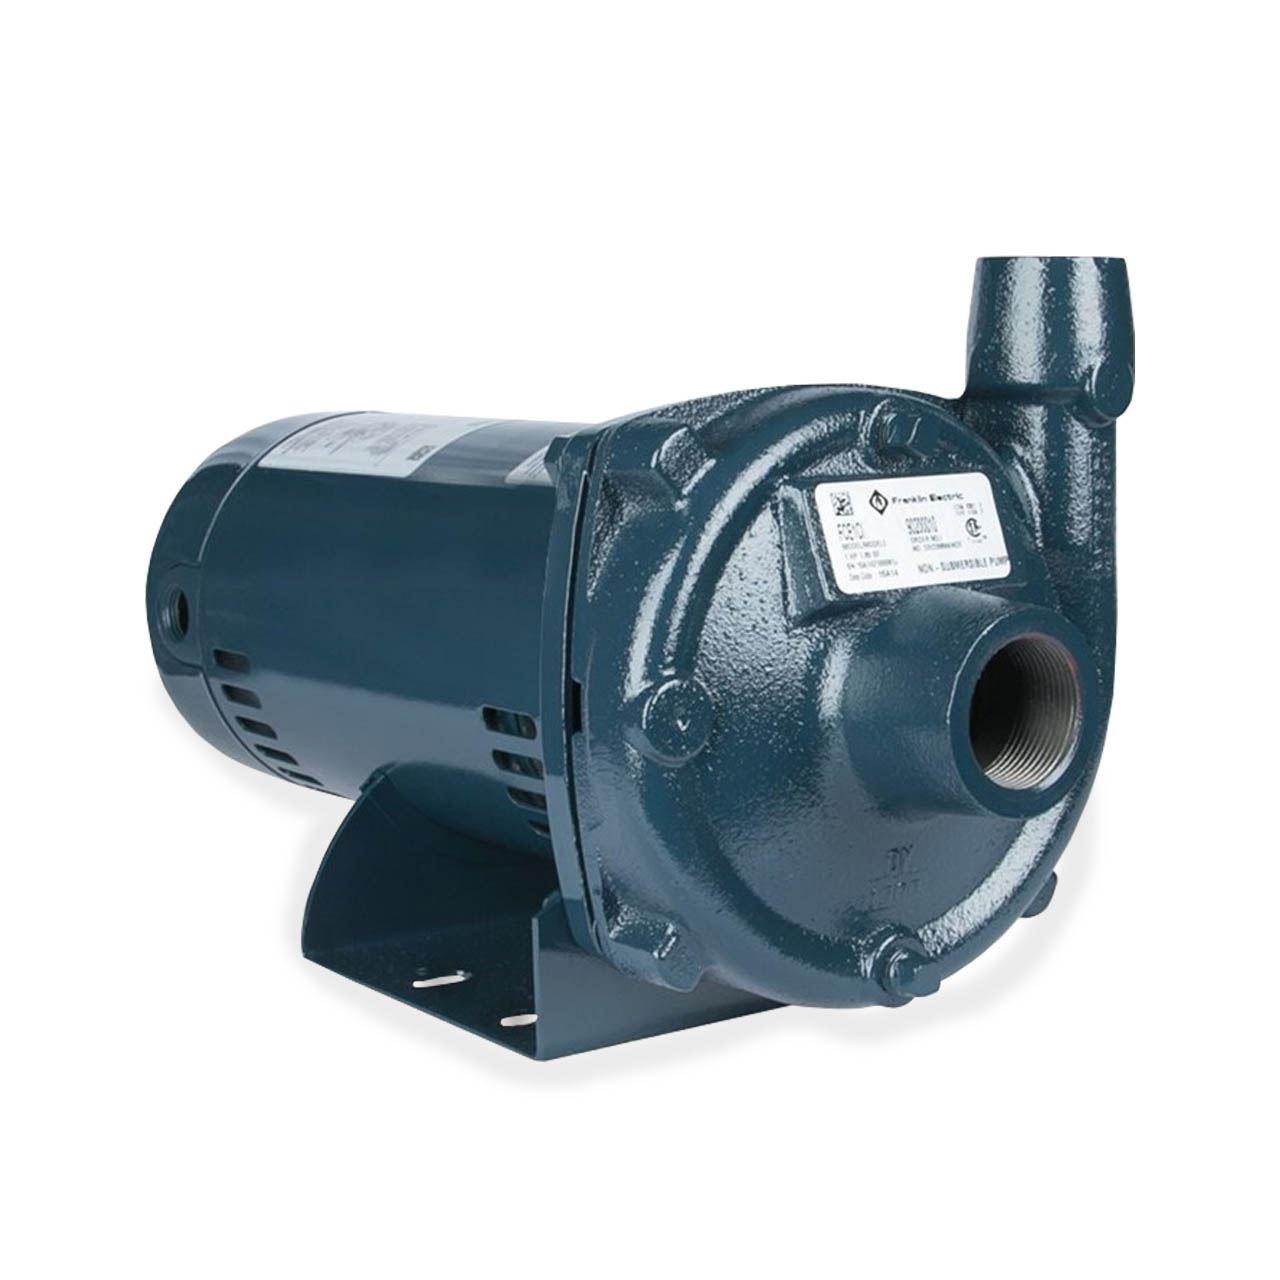 franklin electric fce1ci t fce series transfer pump 1 0 hp 208 230 460v 3ph leeson m84t17db1a motor wiring diagrams 115 230 on franklin electric motor wiring diagrams #14